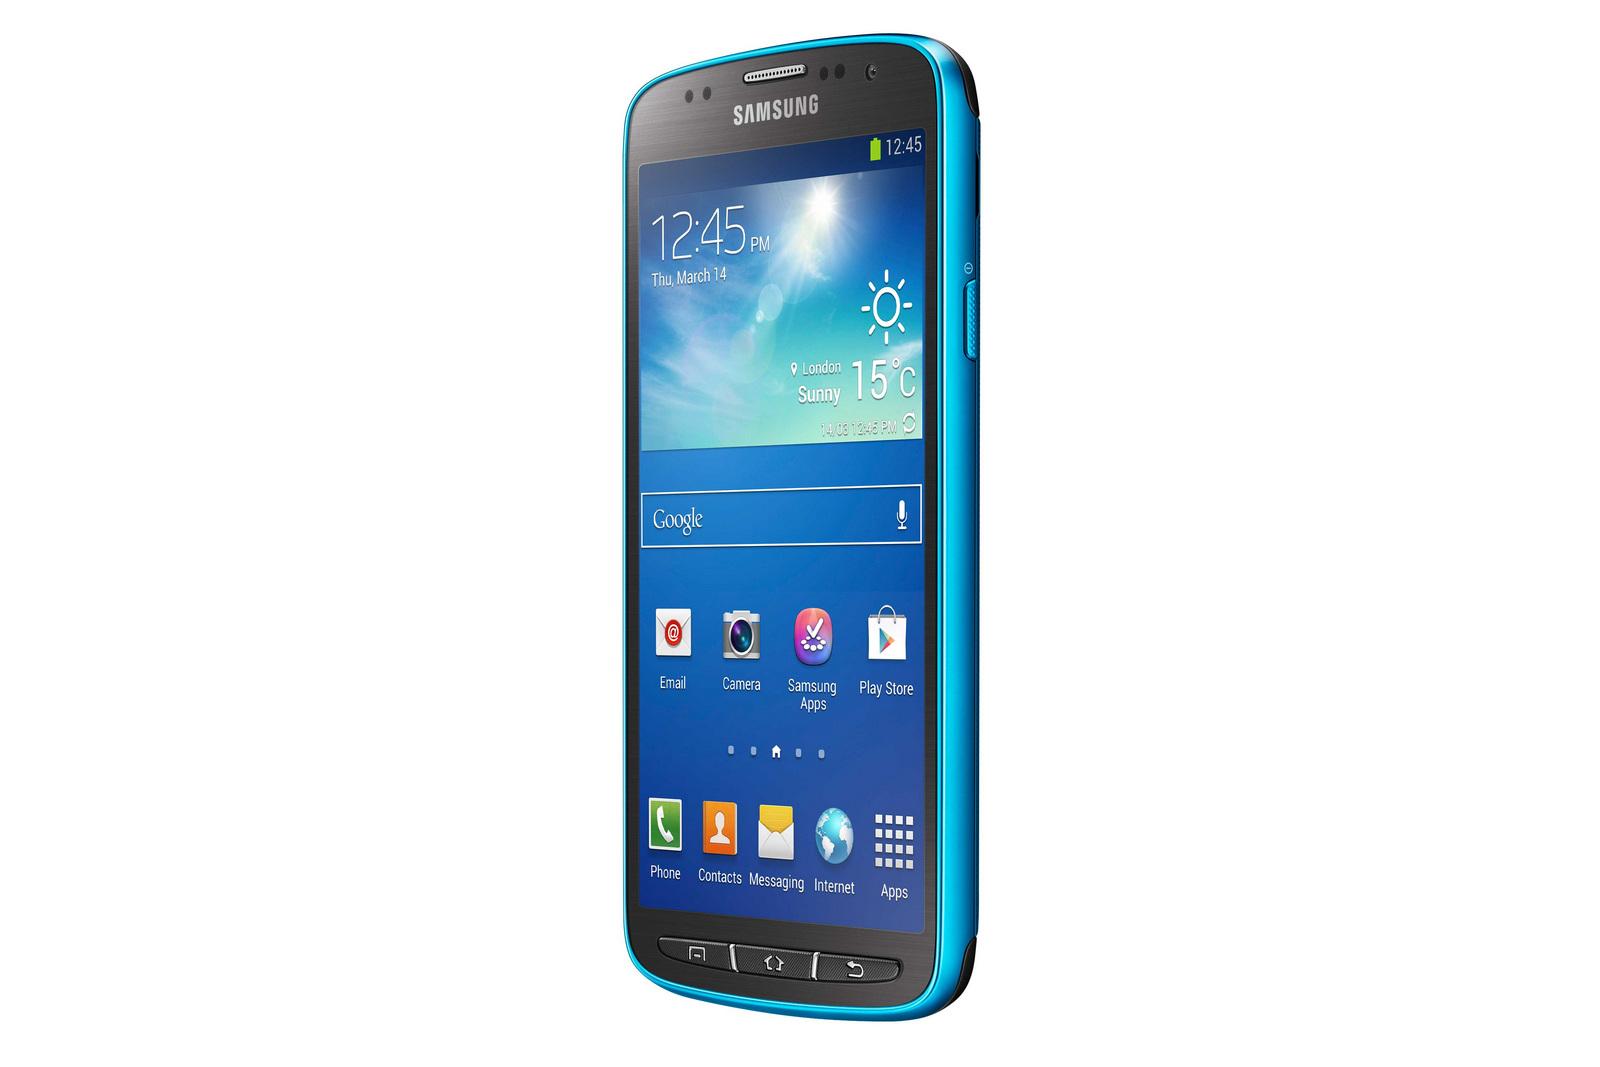 Galaxy s4 release date in Melbourne